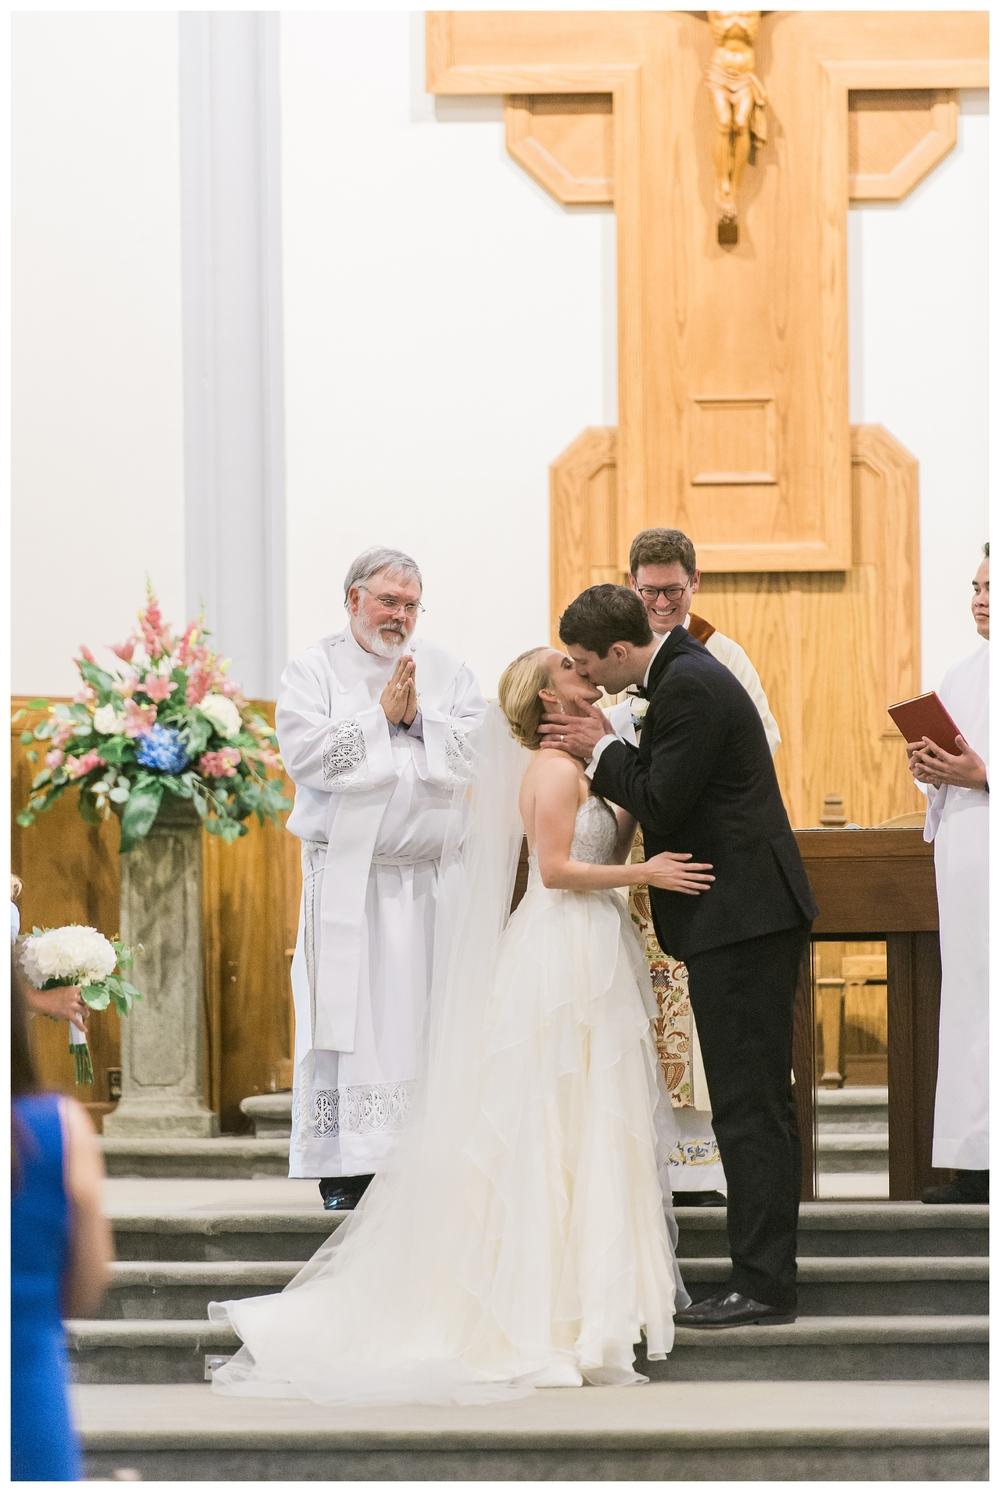 Rebecca_Bridges_Photography_Indianapolis_Wedding_Photographer_4535.jpg